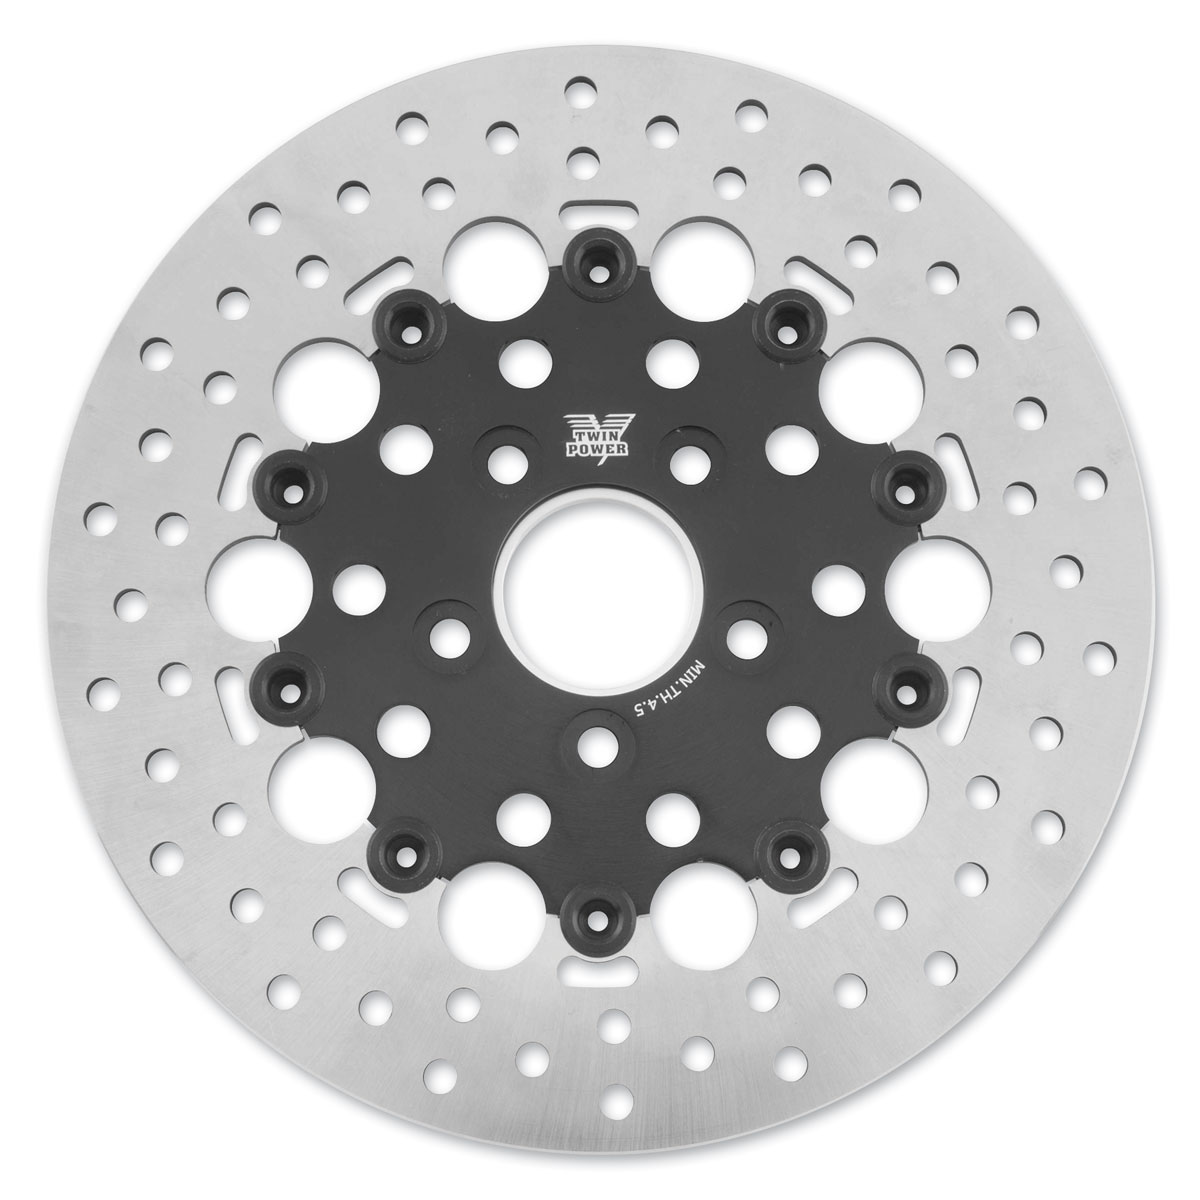 Twin Power Rear Black Floating Round Hole Brake Rotor